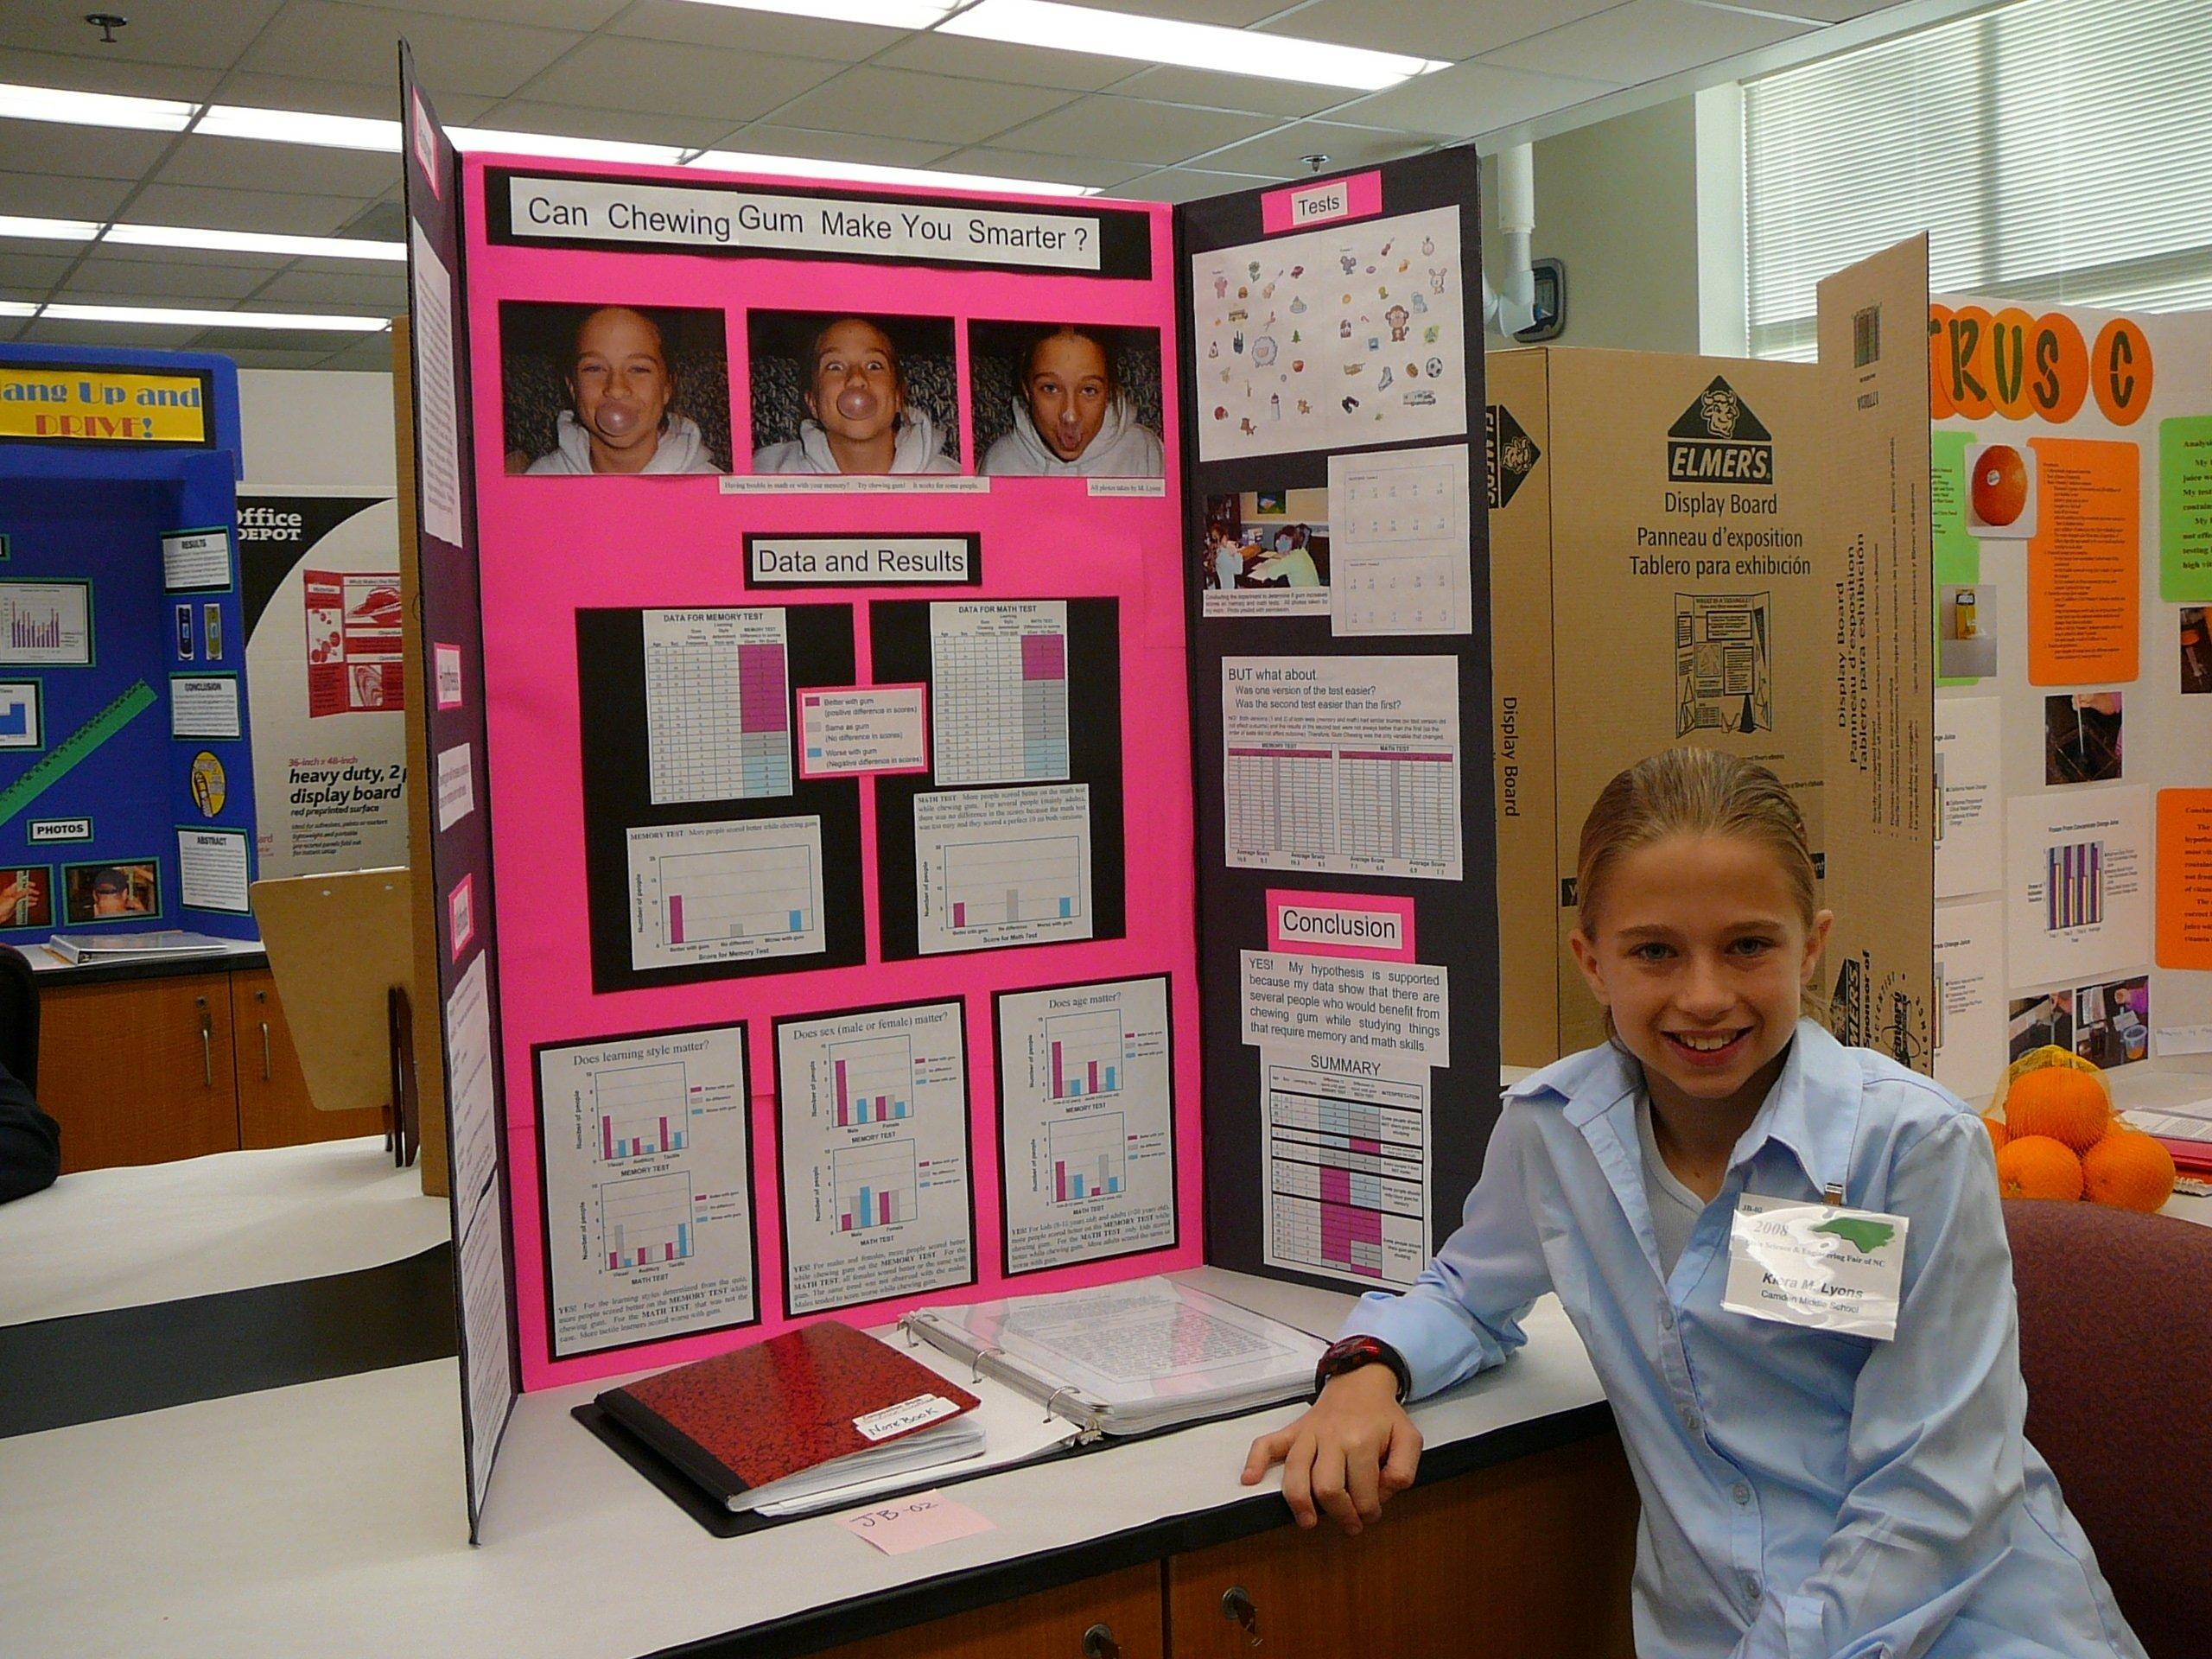 10 Fantastic Science Fair Project Ideas For 3Rd Graders match the science fair project to the type of kid science fair 2020